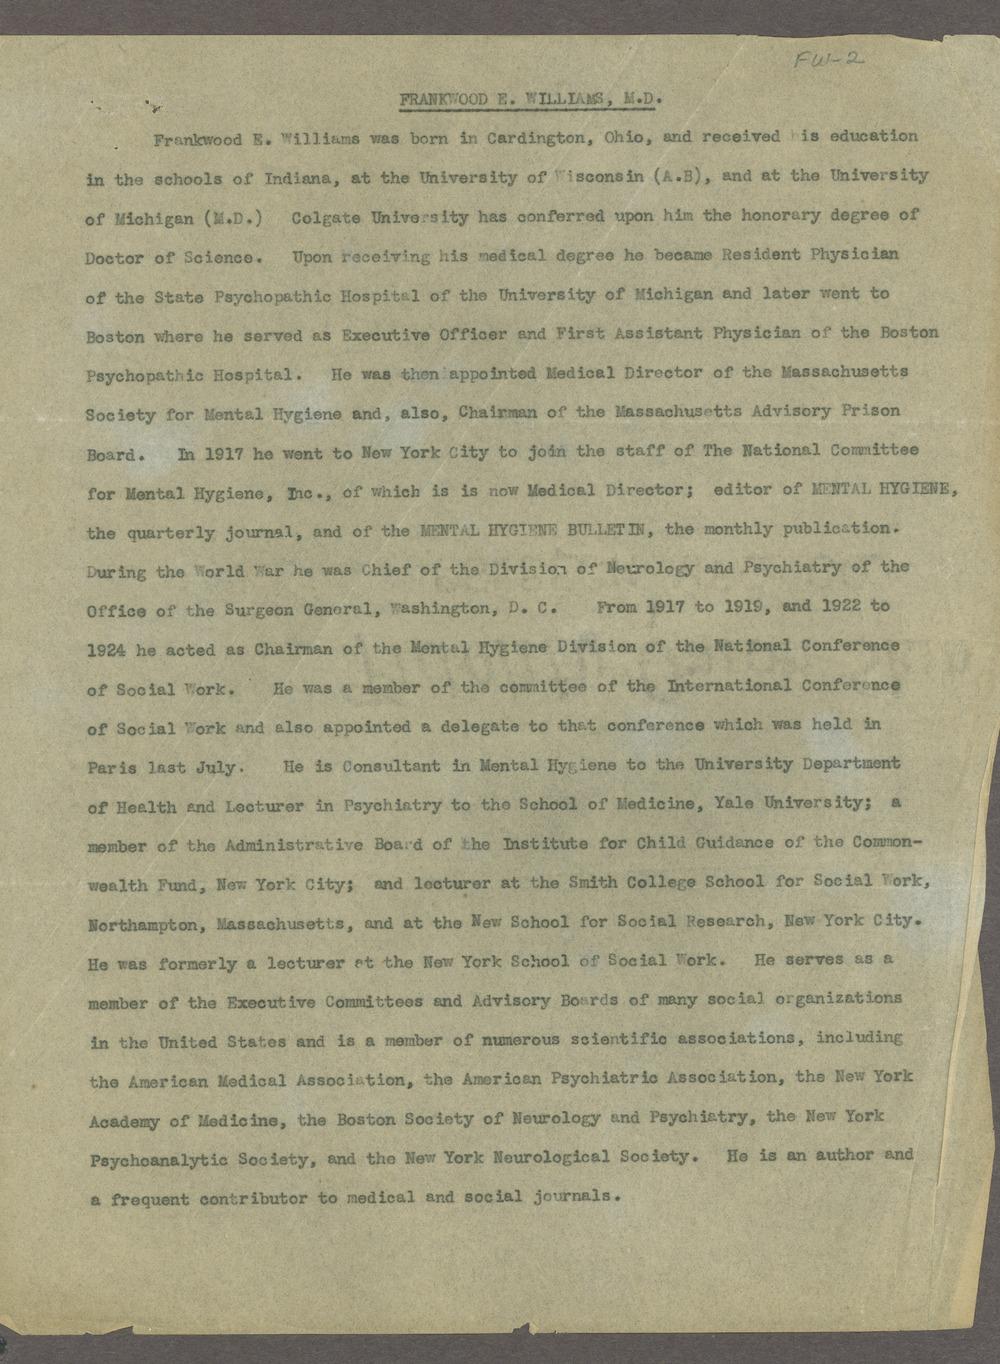 Frankwood E. Williams Papers - Biographical Sketch  (Box 2, folder 1)